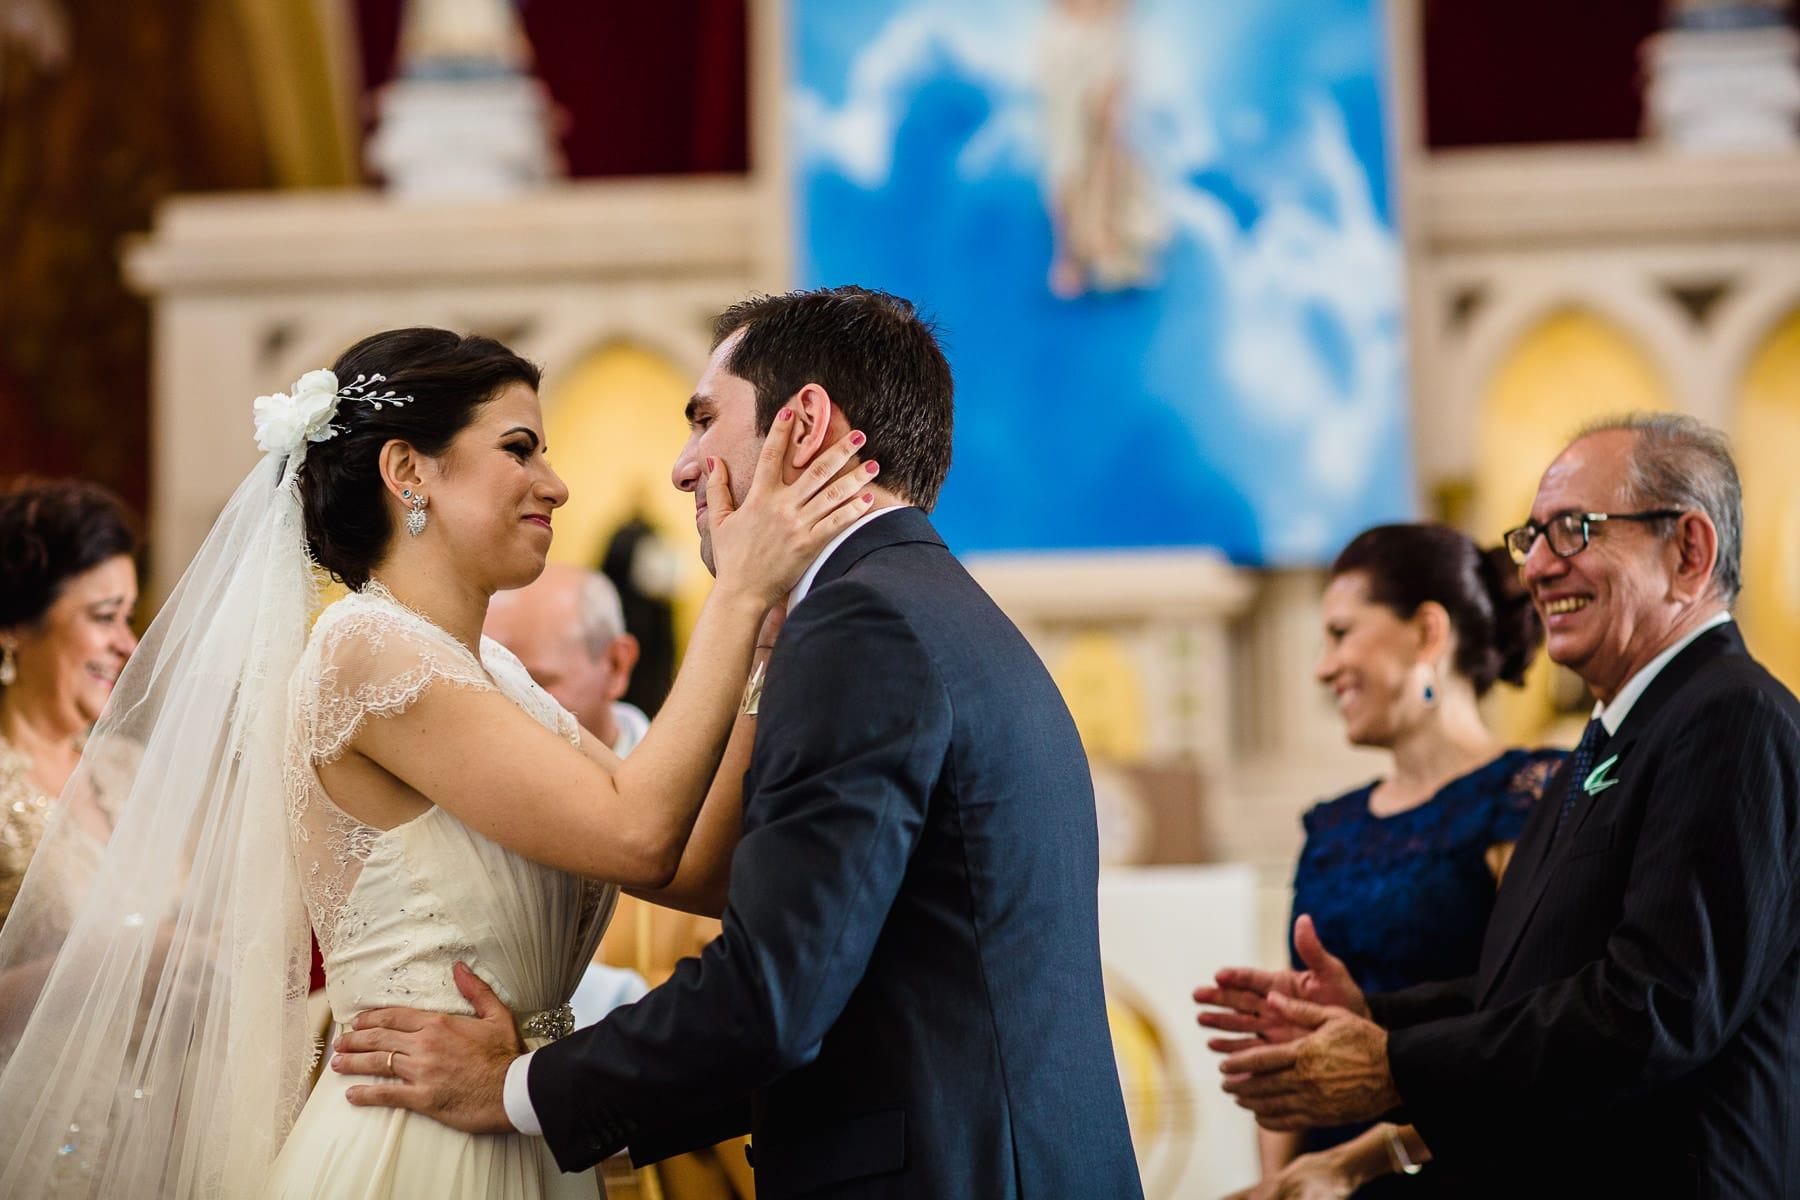 casamento-igreja-do-cristo-rei-fortaleza-50